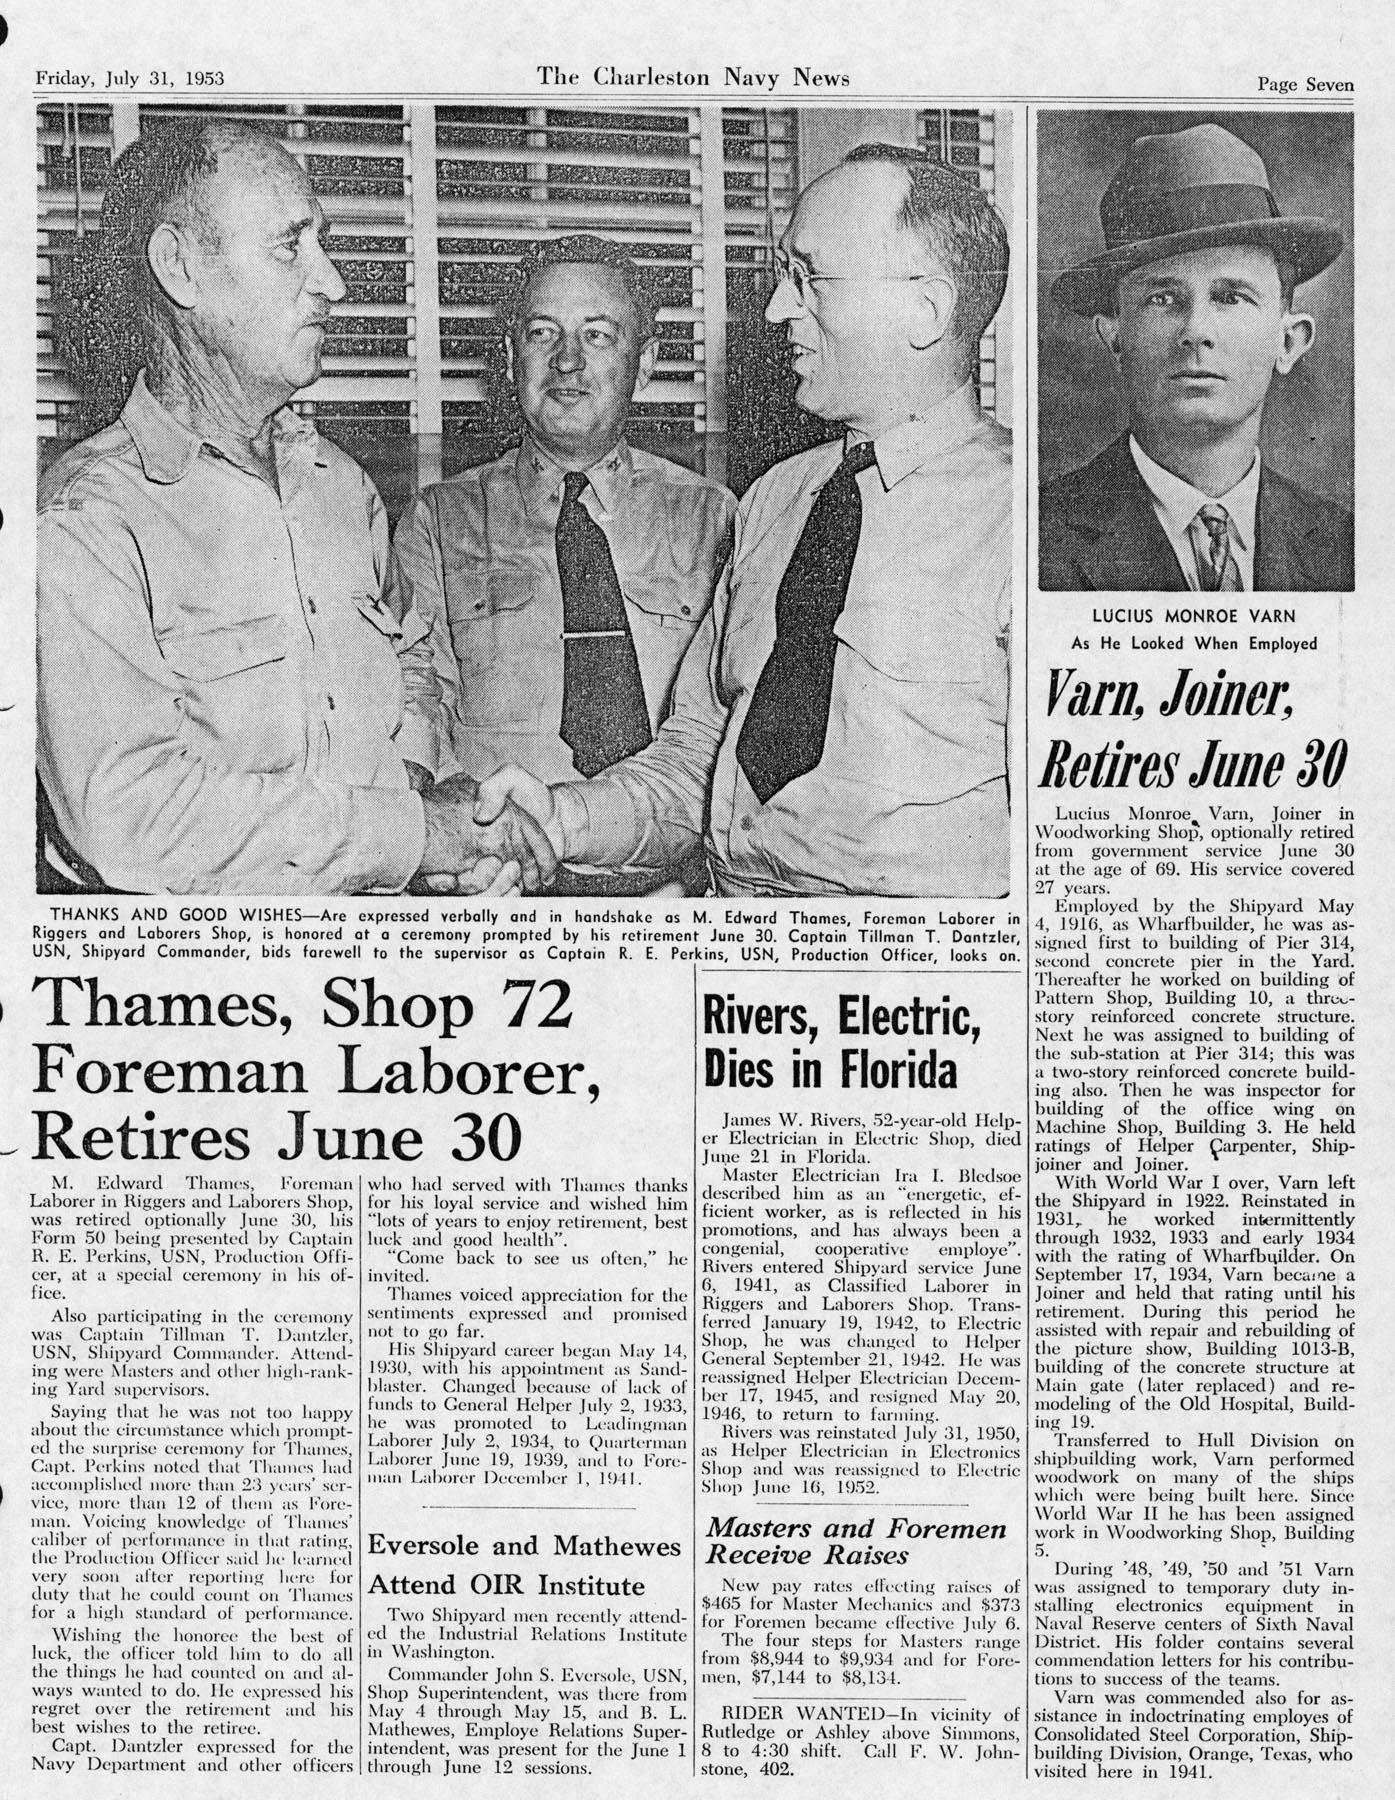 The Charleston Navy News, Volume 12, Edition 1, page vii